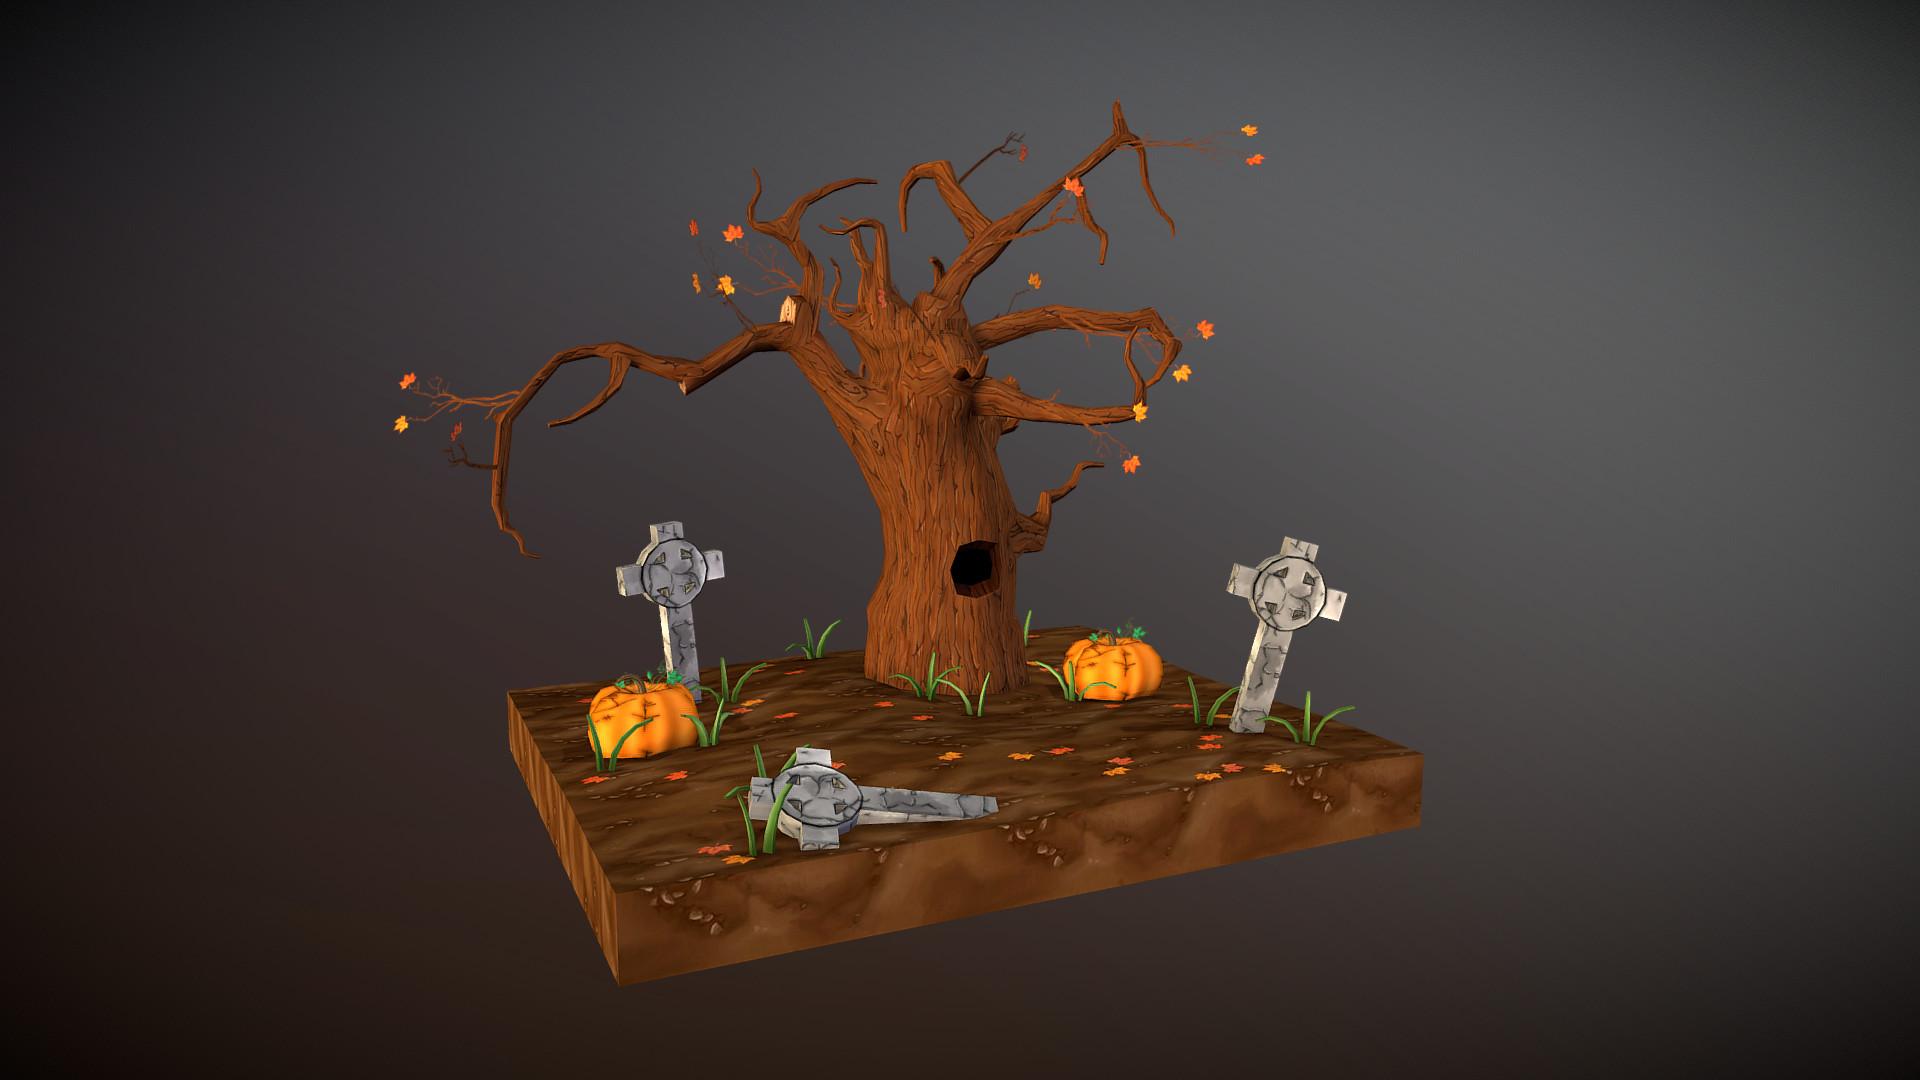 Jordan cameron spooky 2